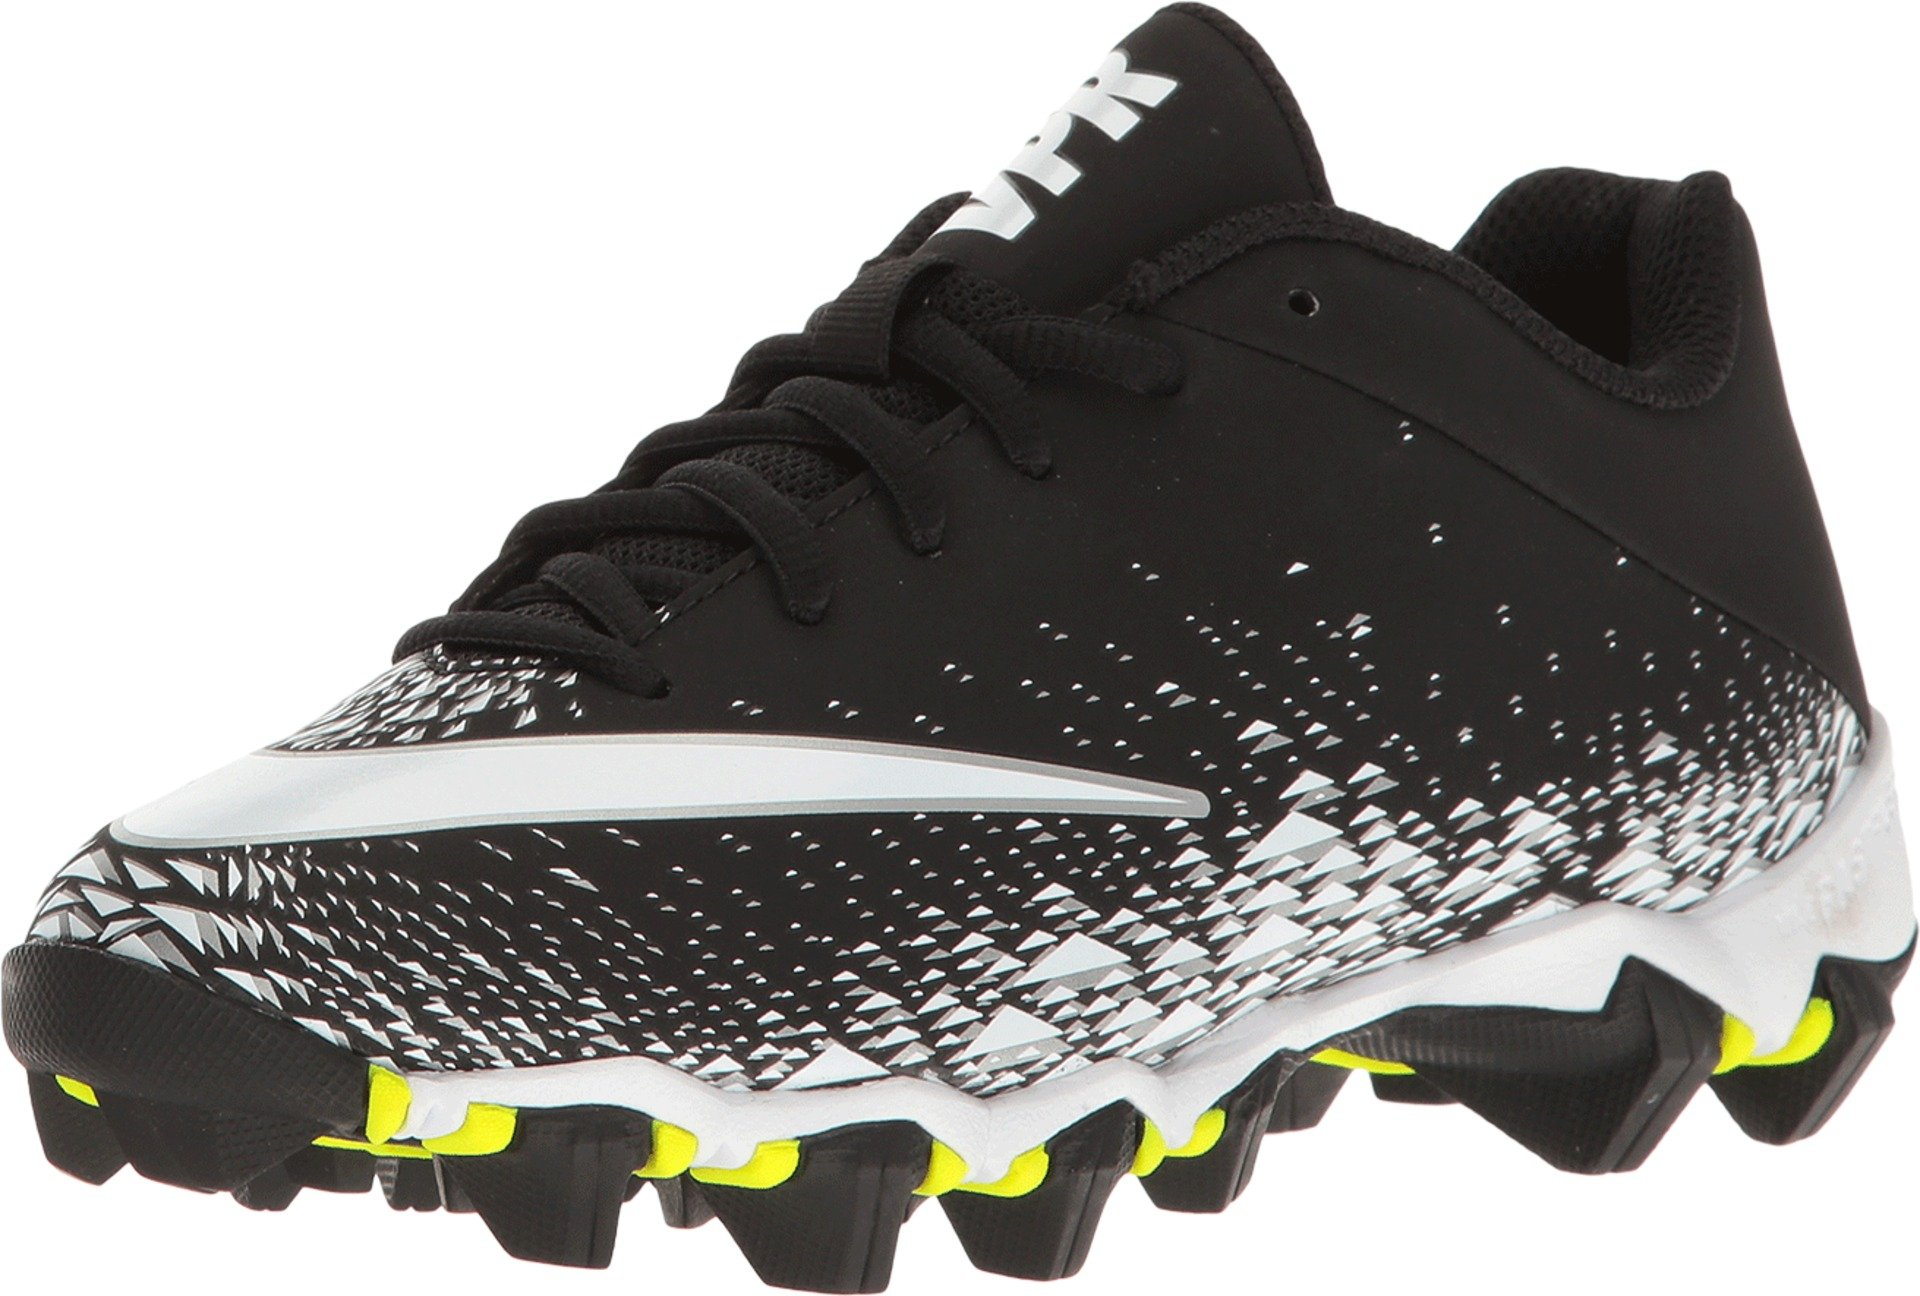 Nike Boy's Vapor Shark 2.0 (GS) Football Cleat Black/White/Metallic Silver Size 5 M US